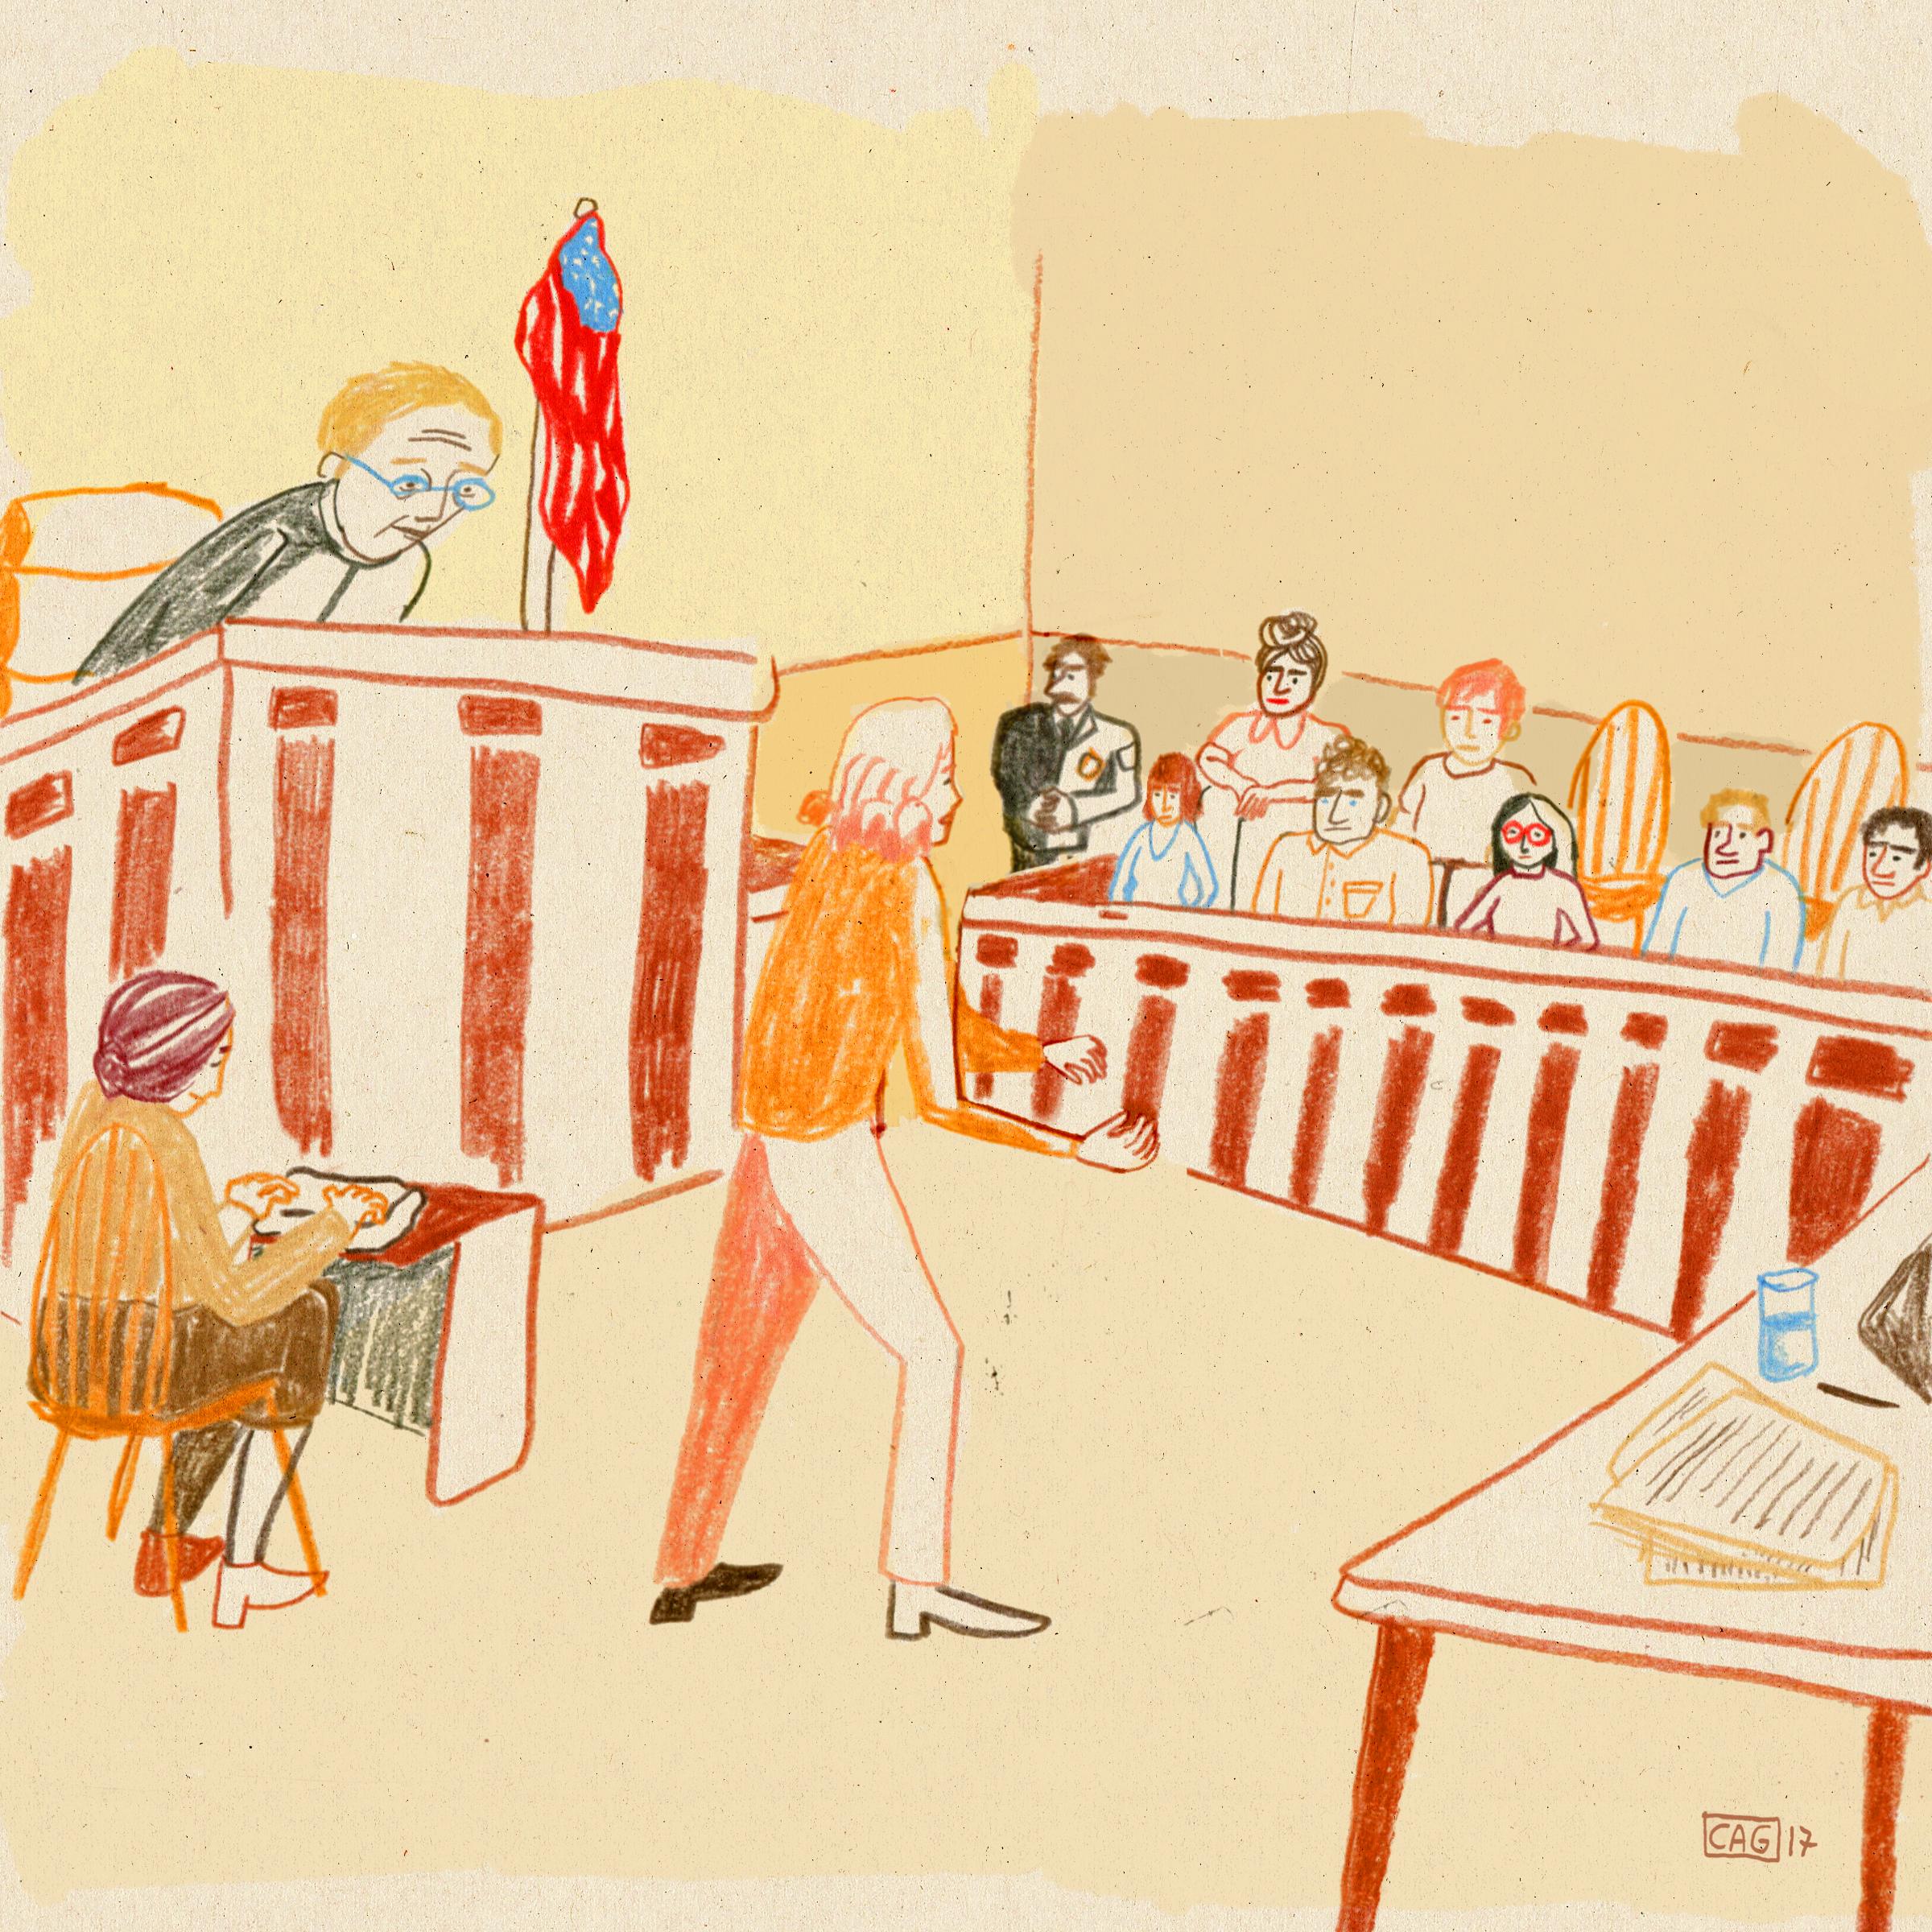 ClaireGallagher_CourtroomIllustration.jpg